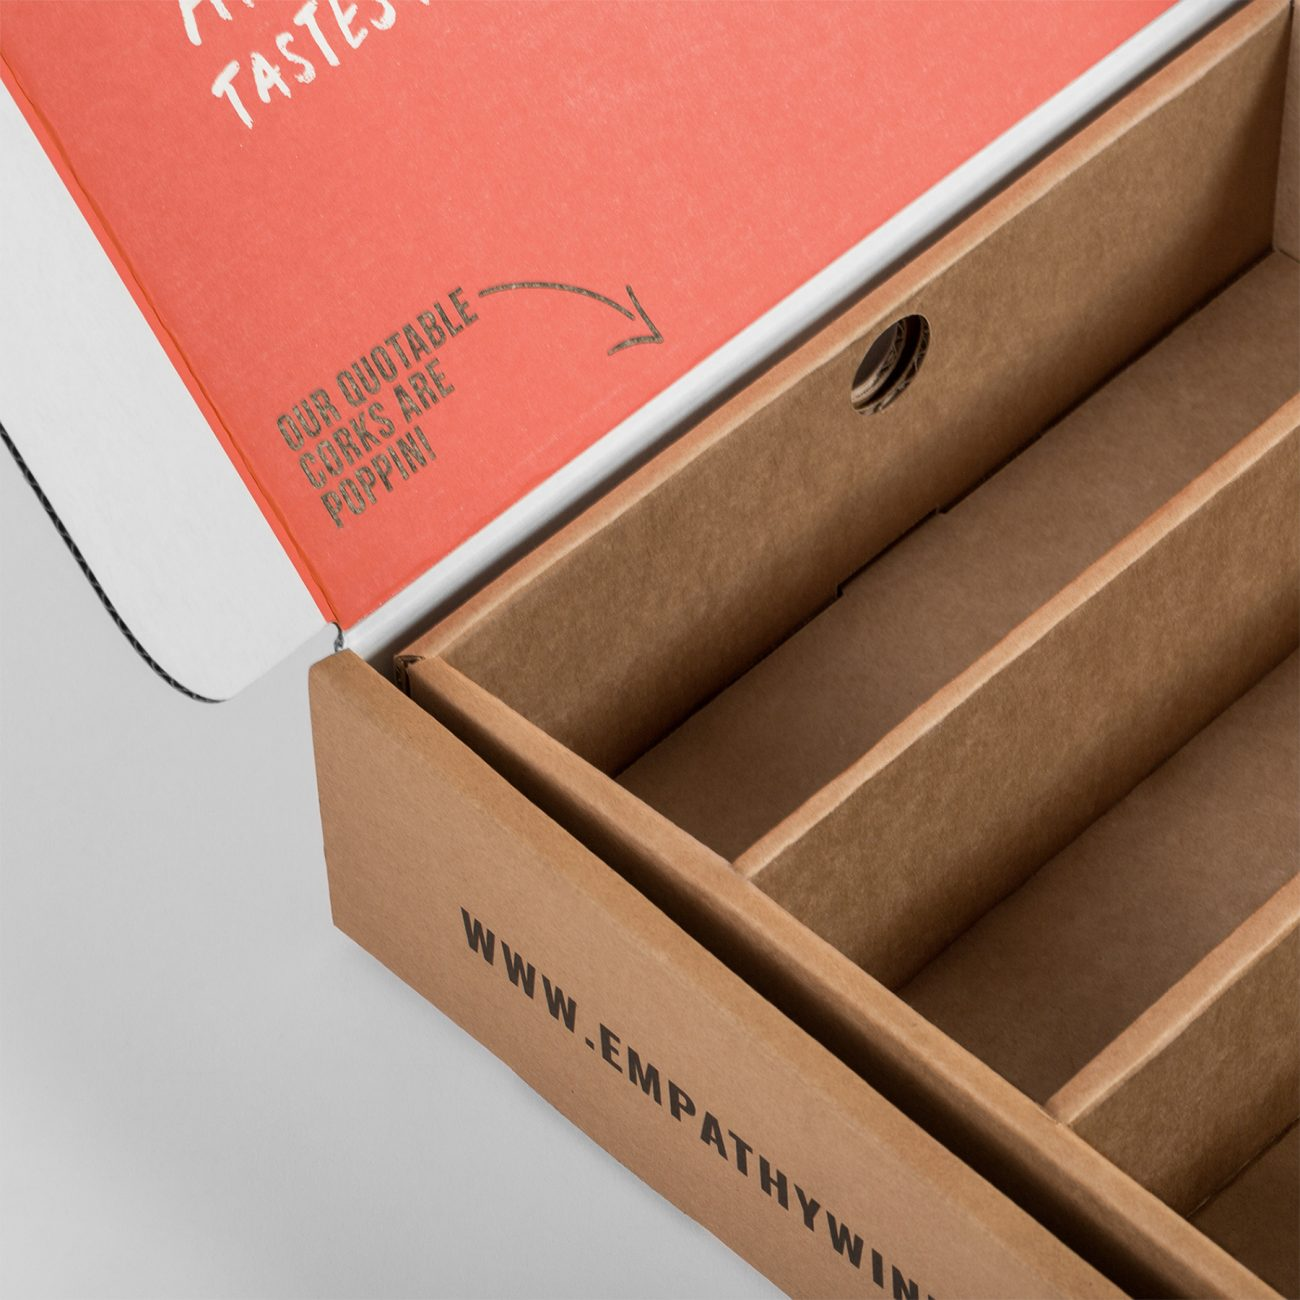 Empathy Wines Corrugated Inserts, Corrugated Mailer Boxes